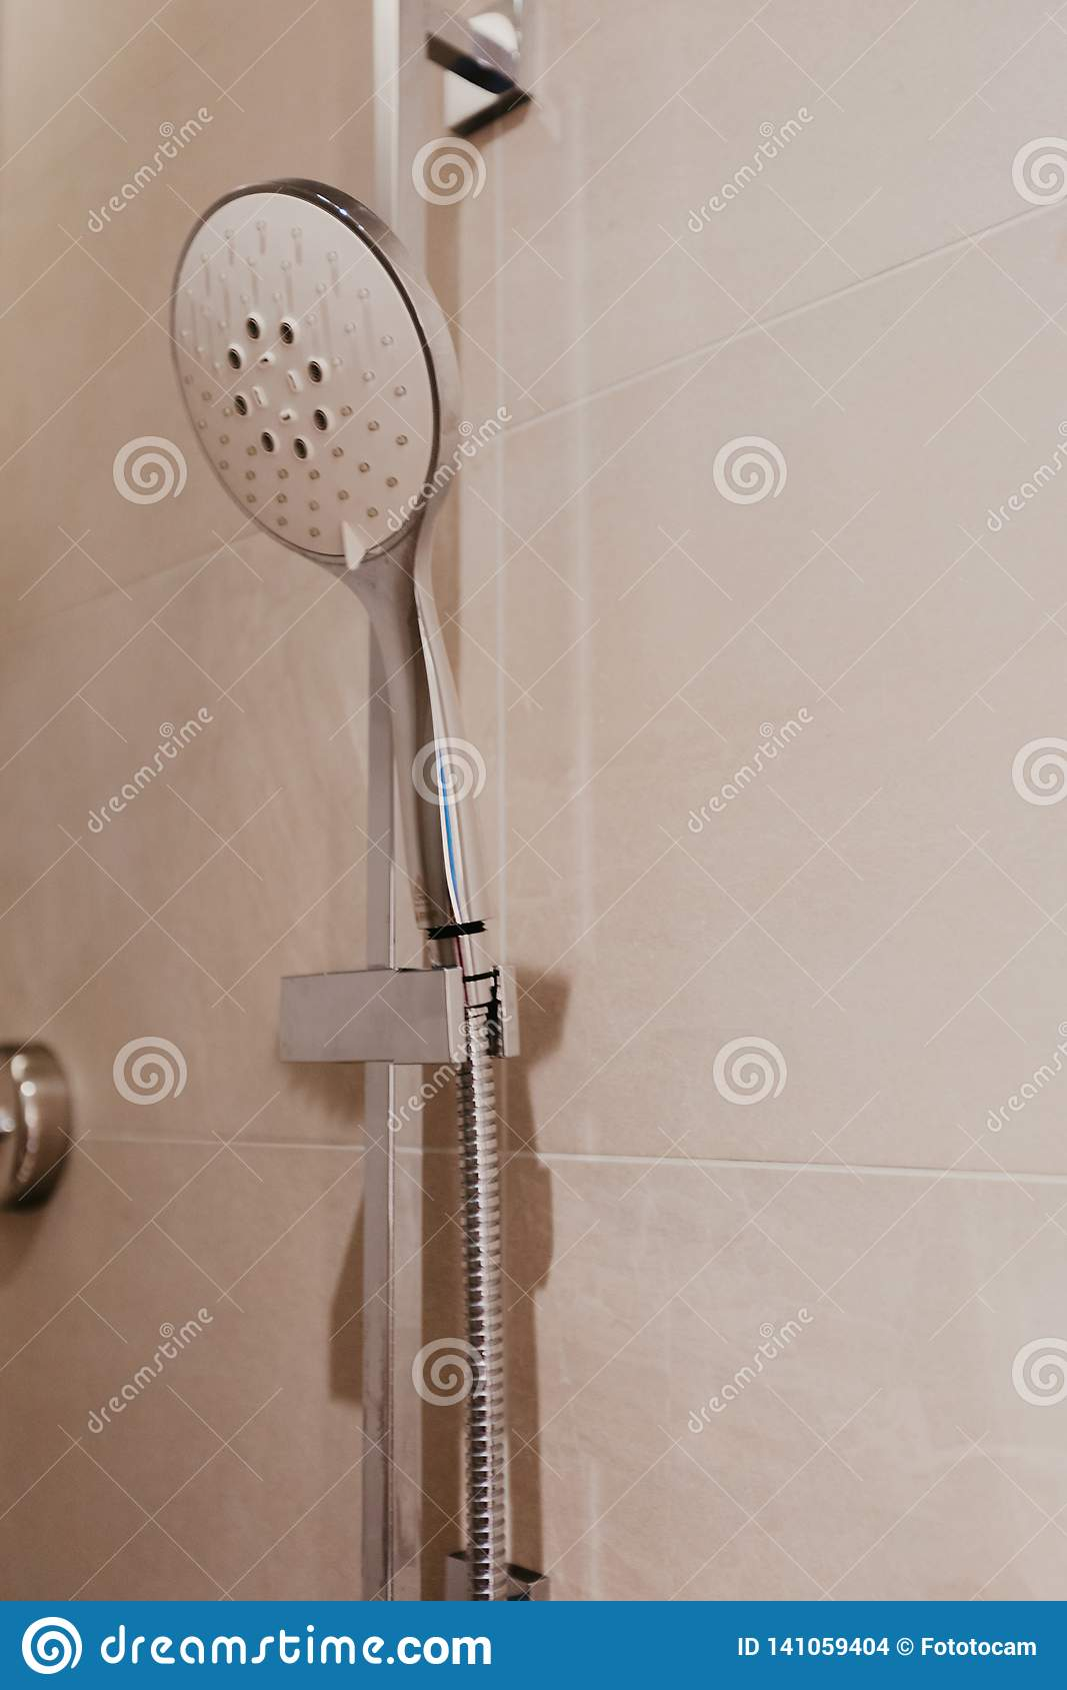 Shower in bathroom interior - Image